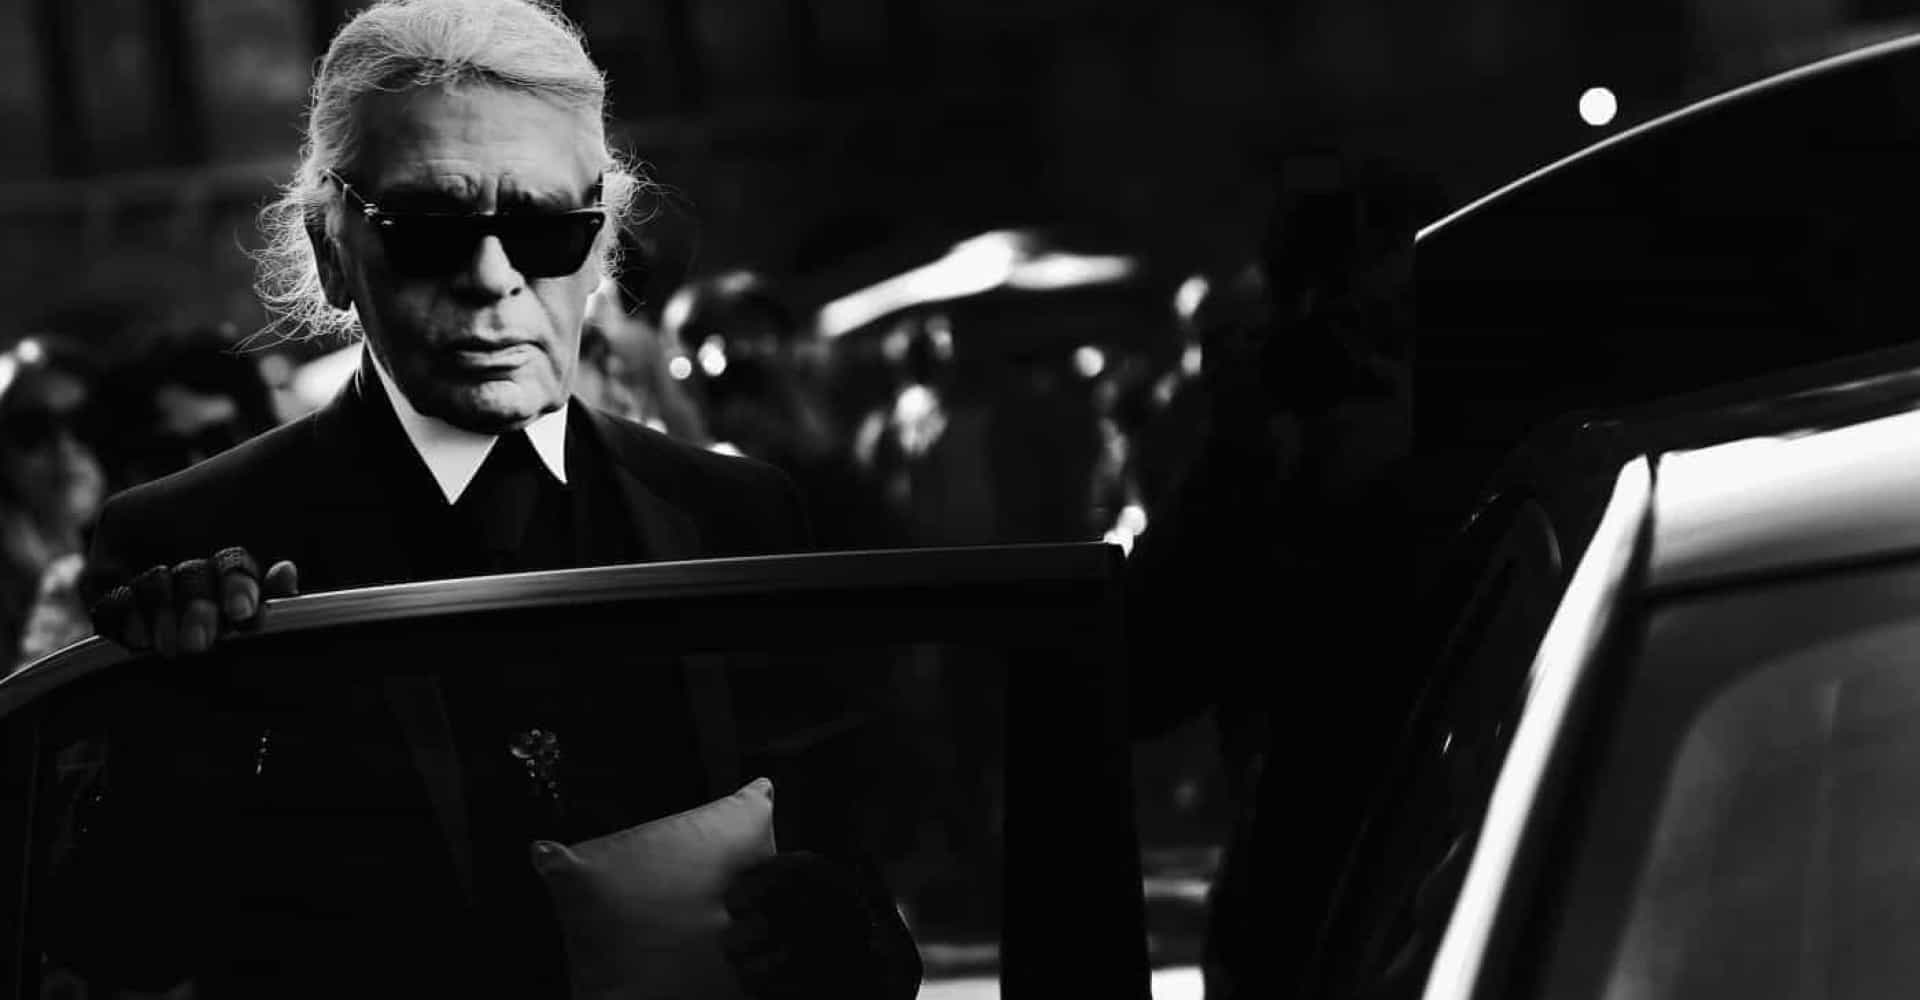 Karl Lagerfeld dør som 85-årig